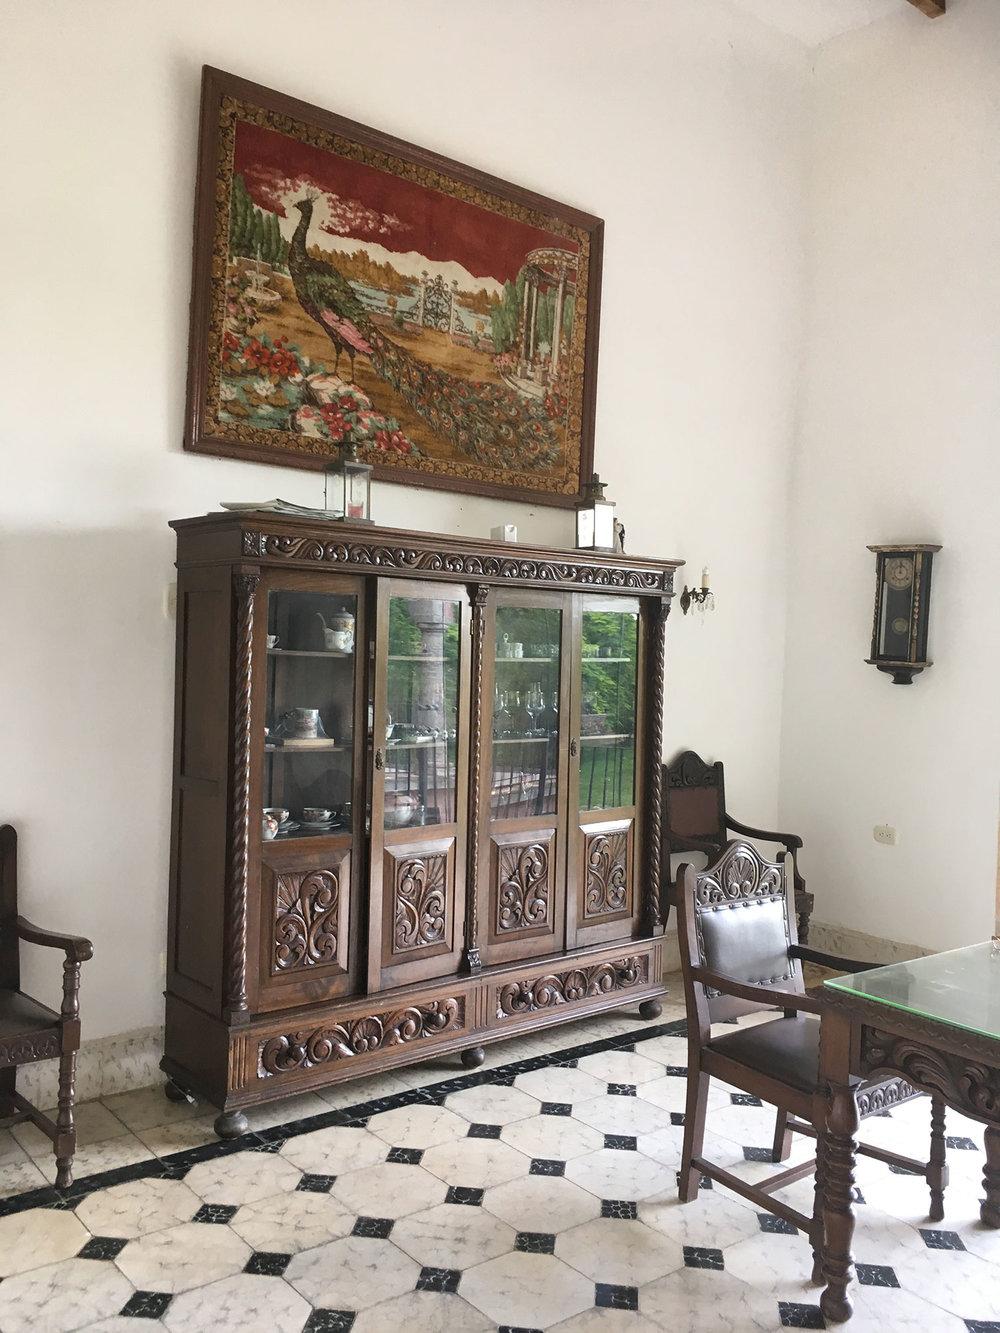 Hammocks_and_Ruins_Blog_Riviera_Maya_Mexico_Travel_Discover_Yucatan_What_to_do_Merida_Haciendas_Tepich_13.jpg